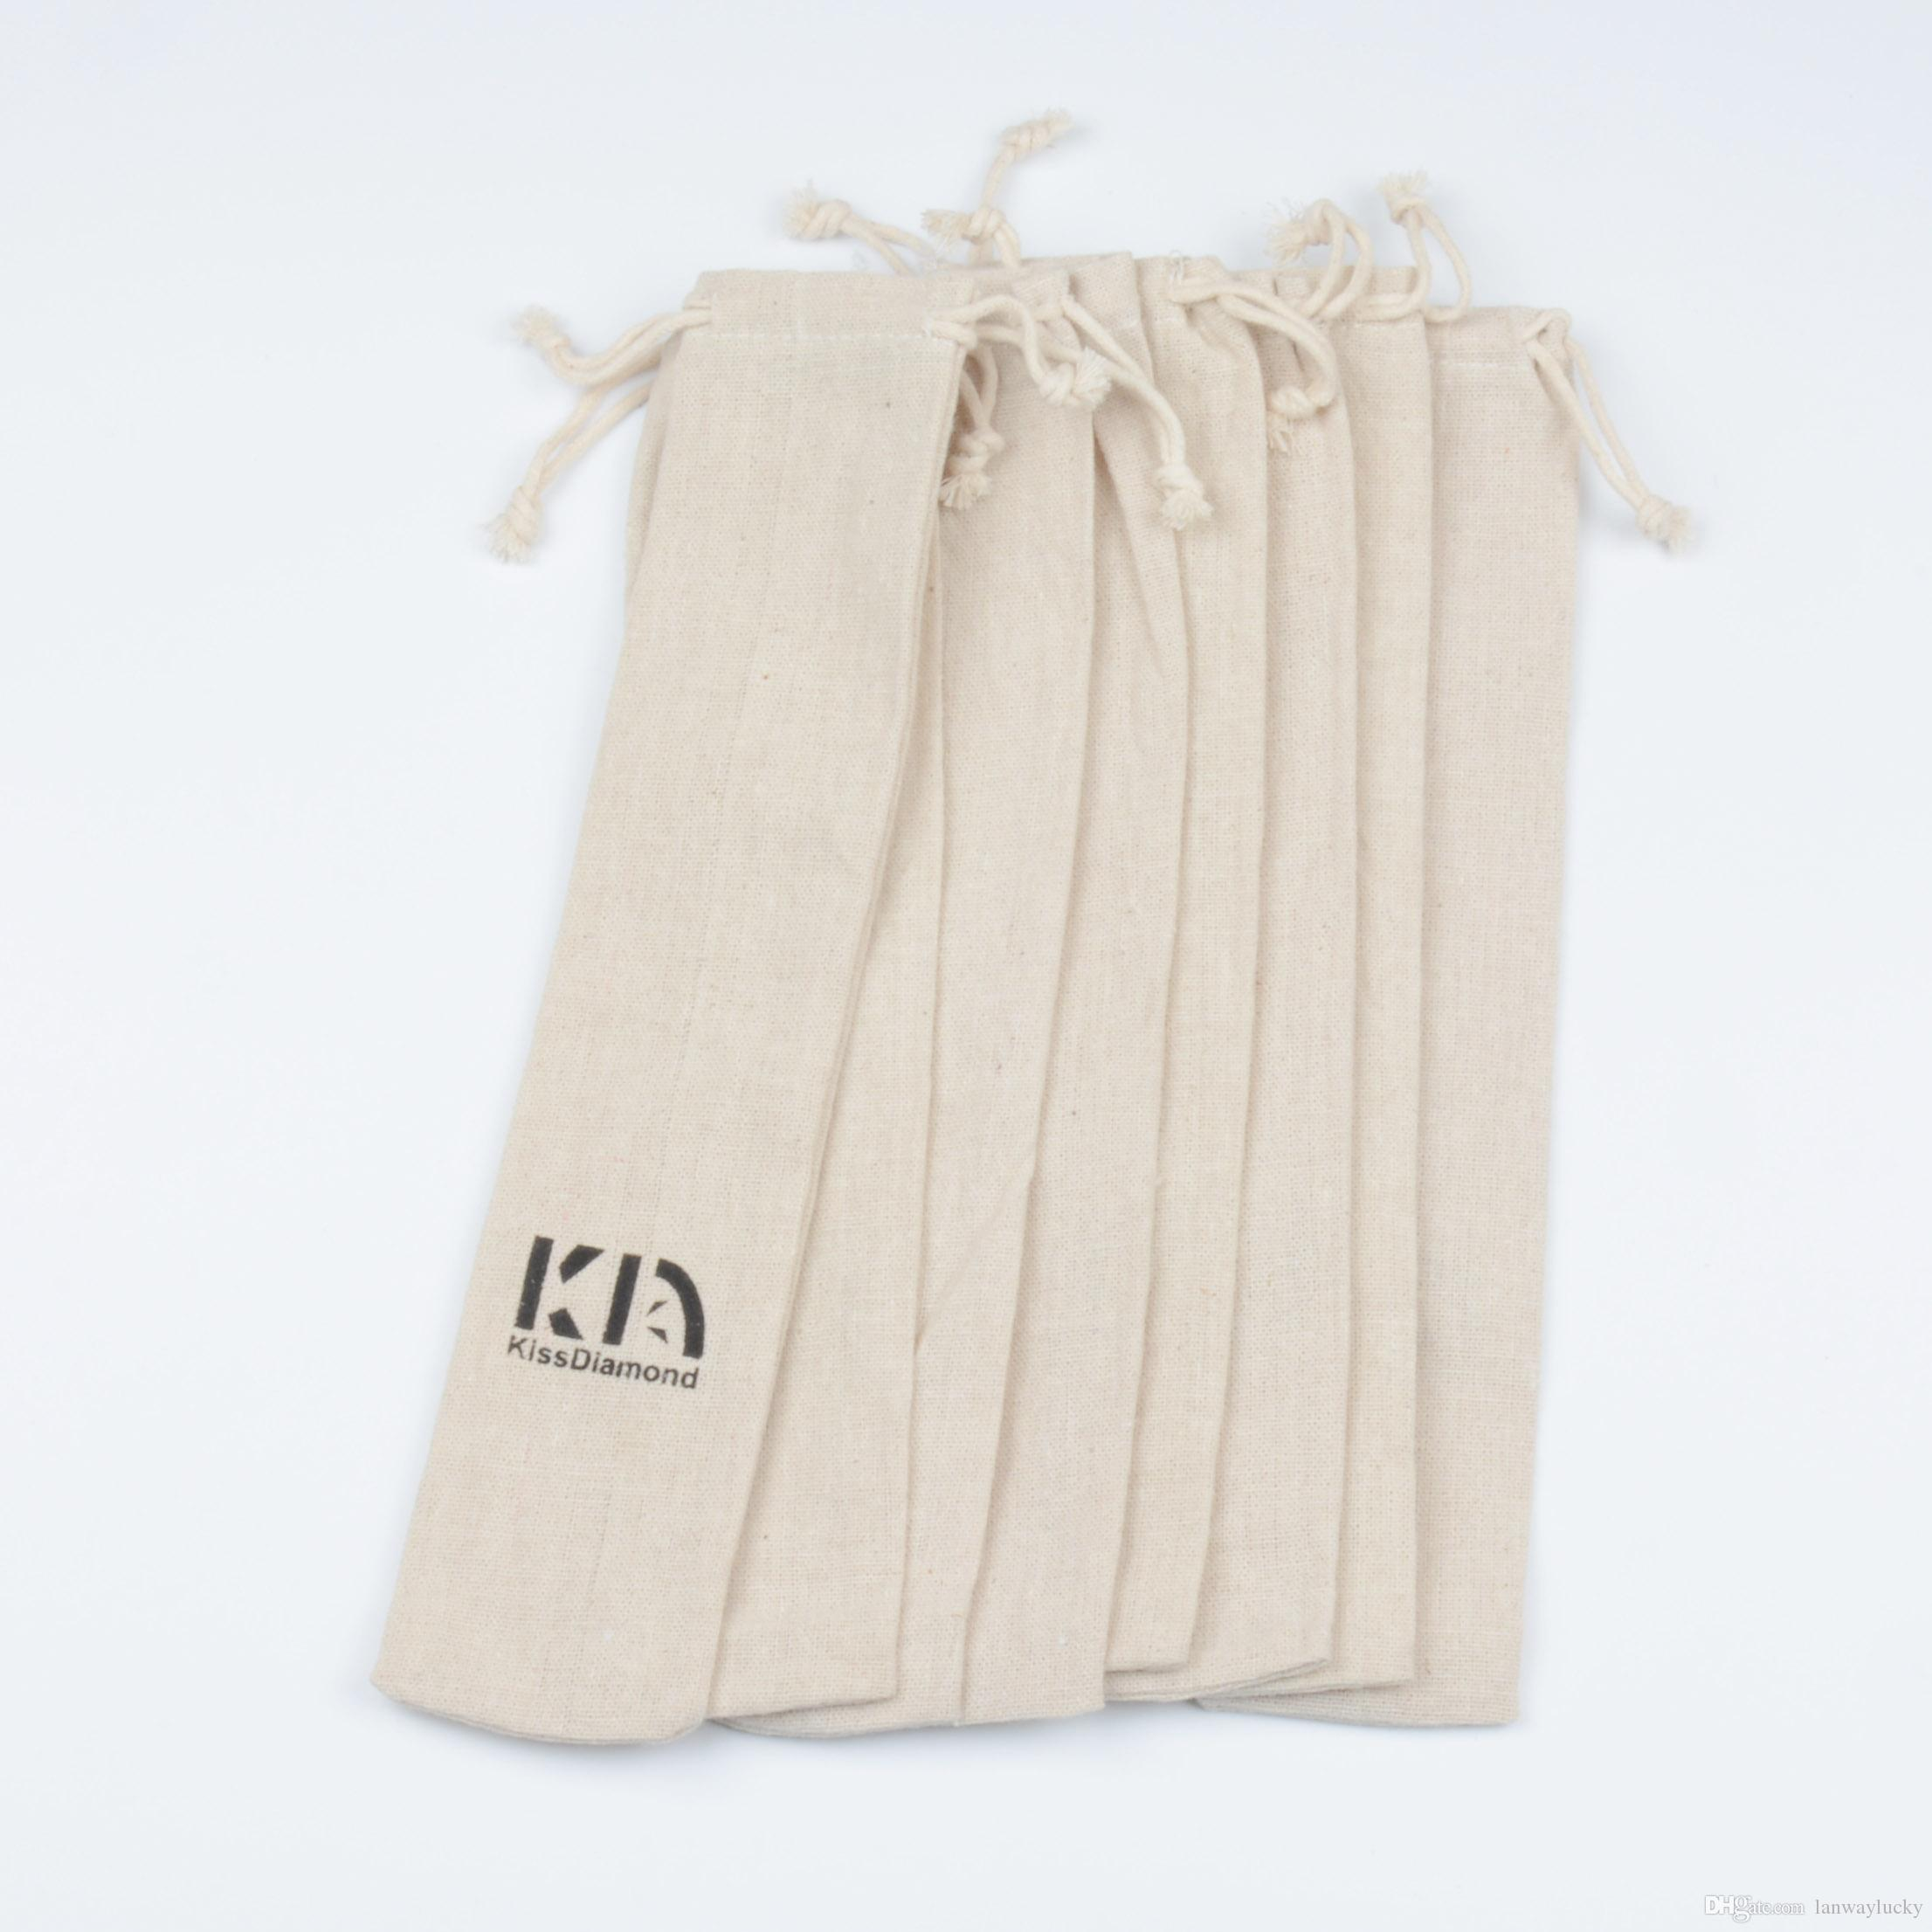 6x27cm DHL Muslin Drawstring Gift Bags Cotton Linen Vintage Straws ...